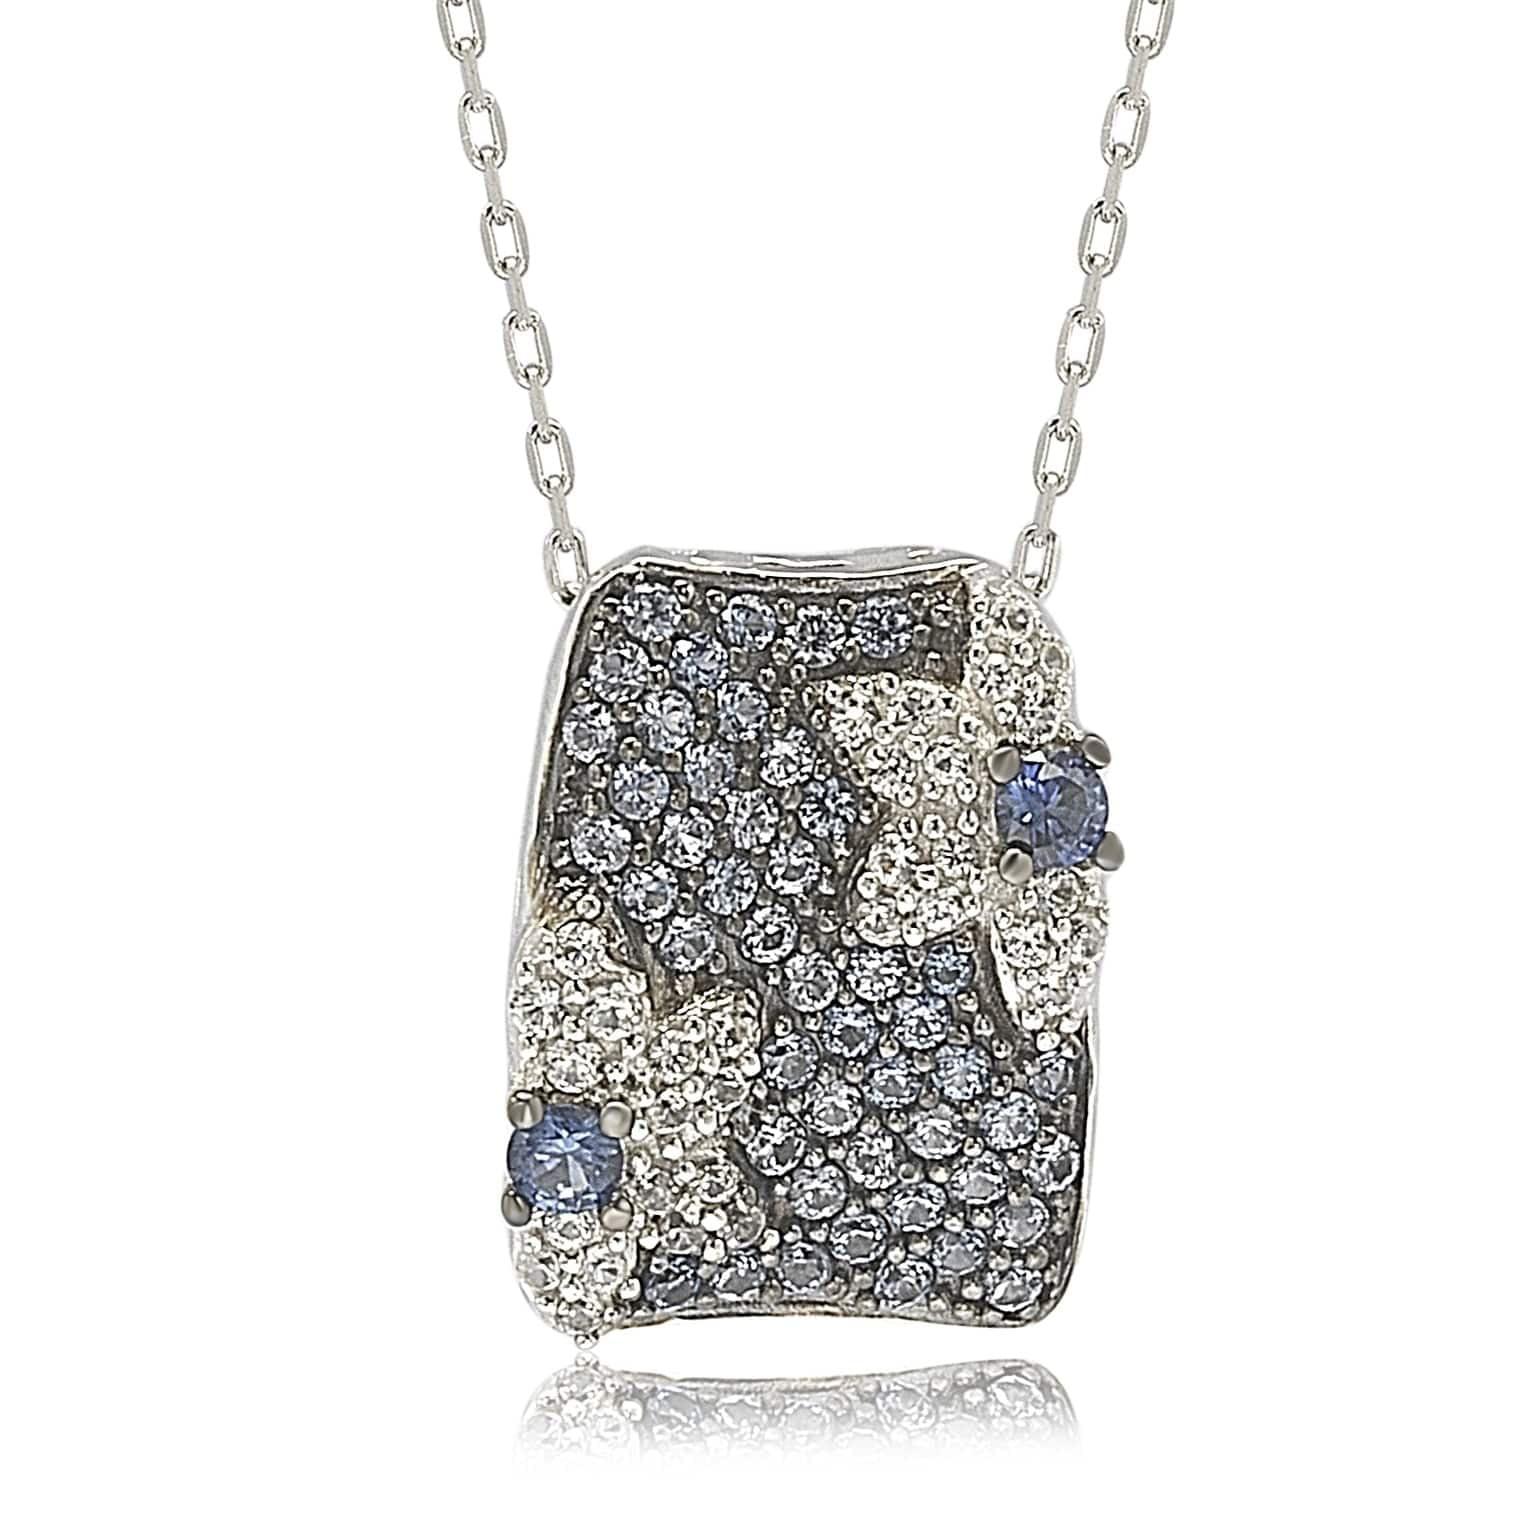 Suzy Levian Sterling Silver Sapphire & Diamond Floral Petite Necklace by Suzy Levian LLC